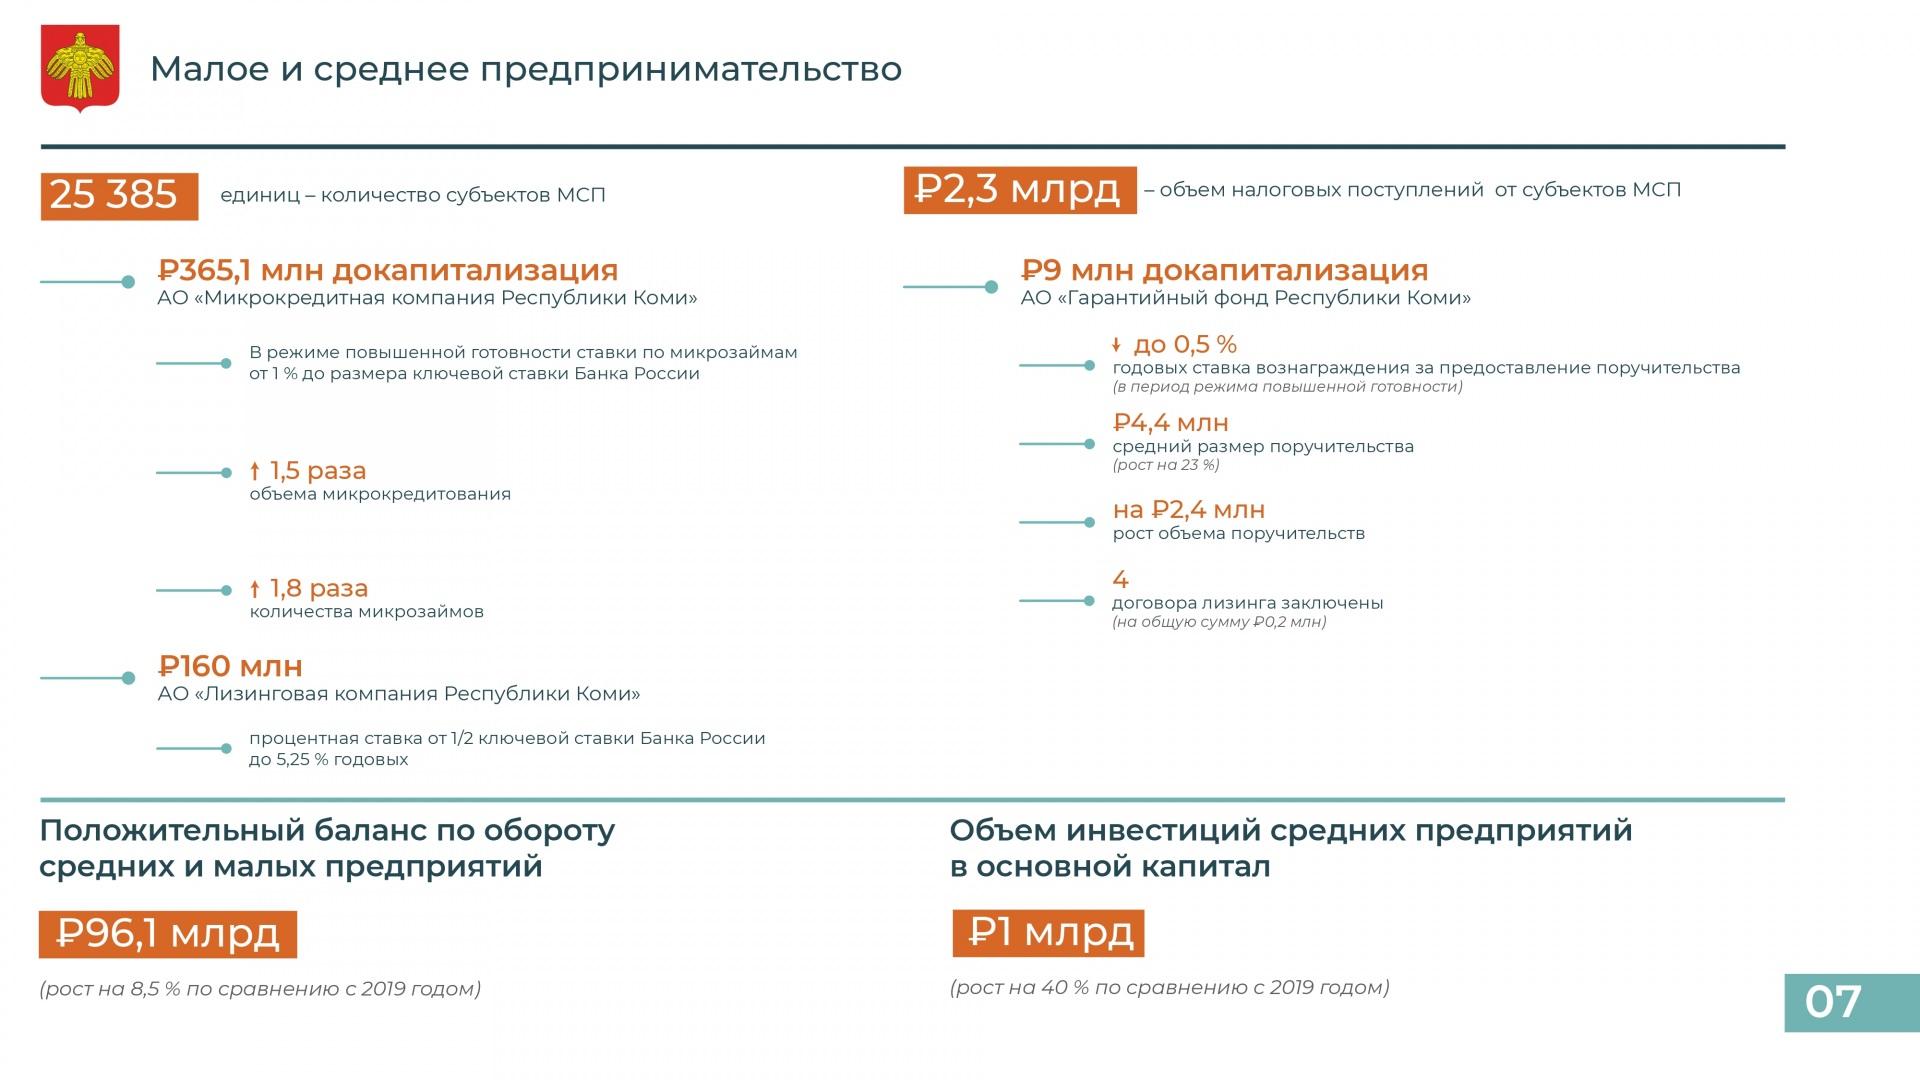 Doklad_Glavy_2021_page-0007.jpg